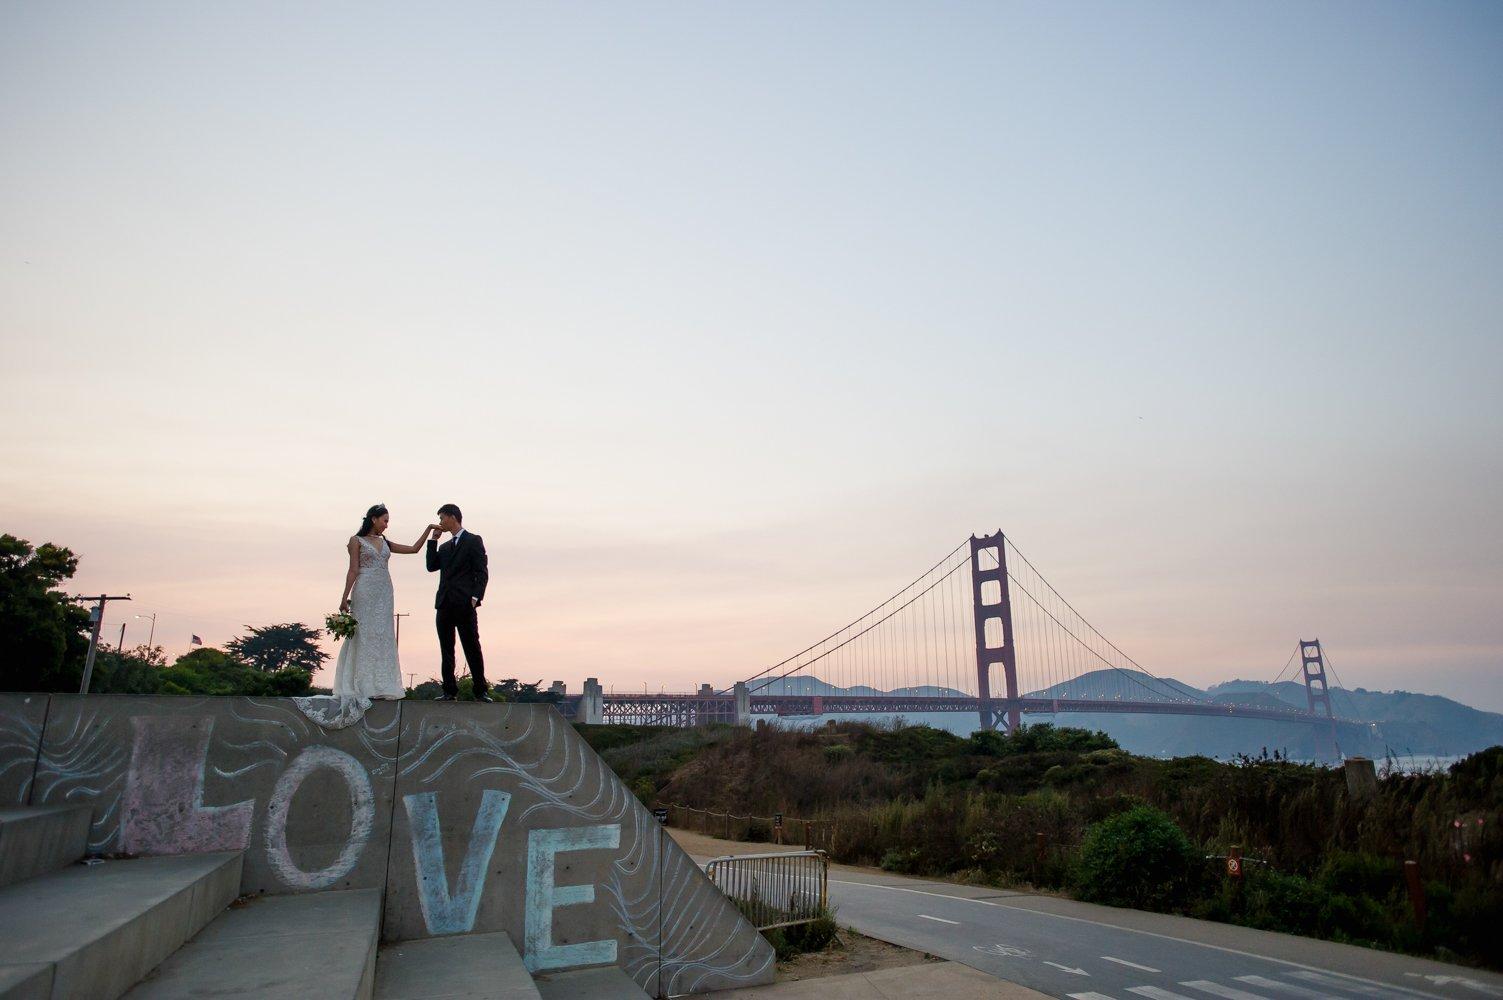 Chloe-Jackman-Photography-SF-Elopement-Golden-Gate-Bridge-2017-483